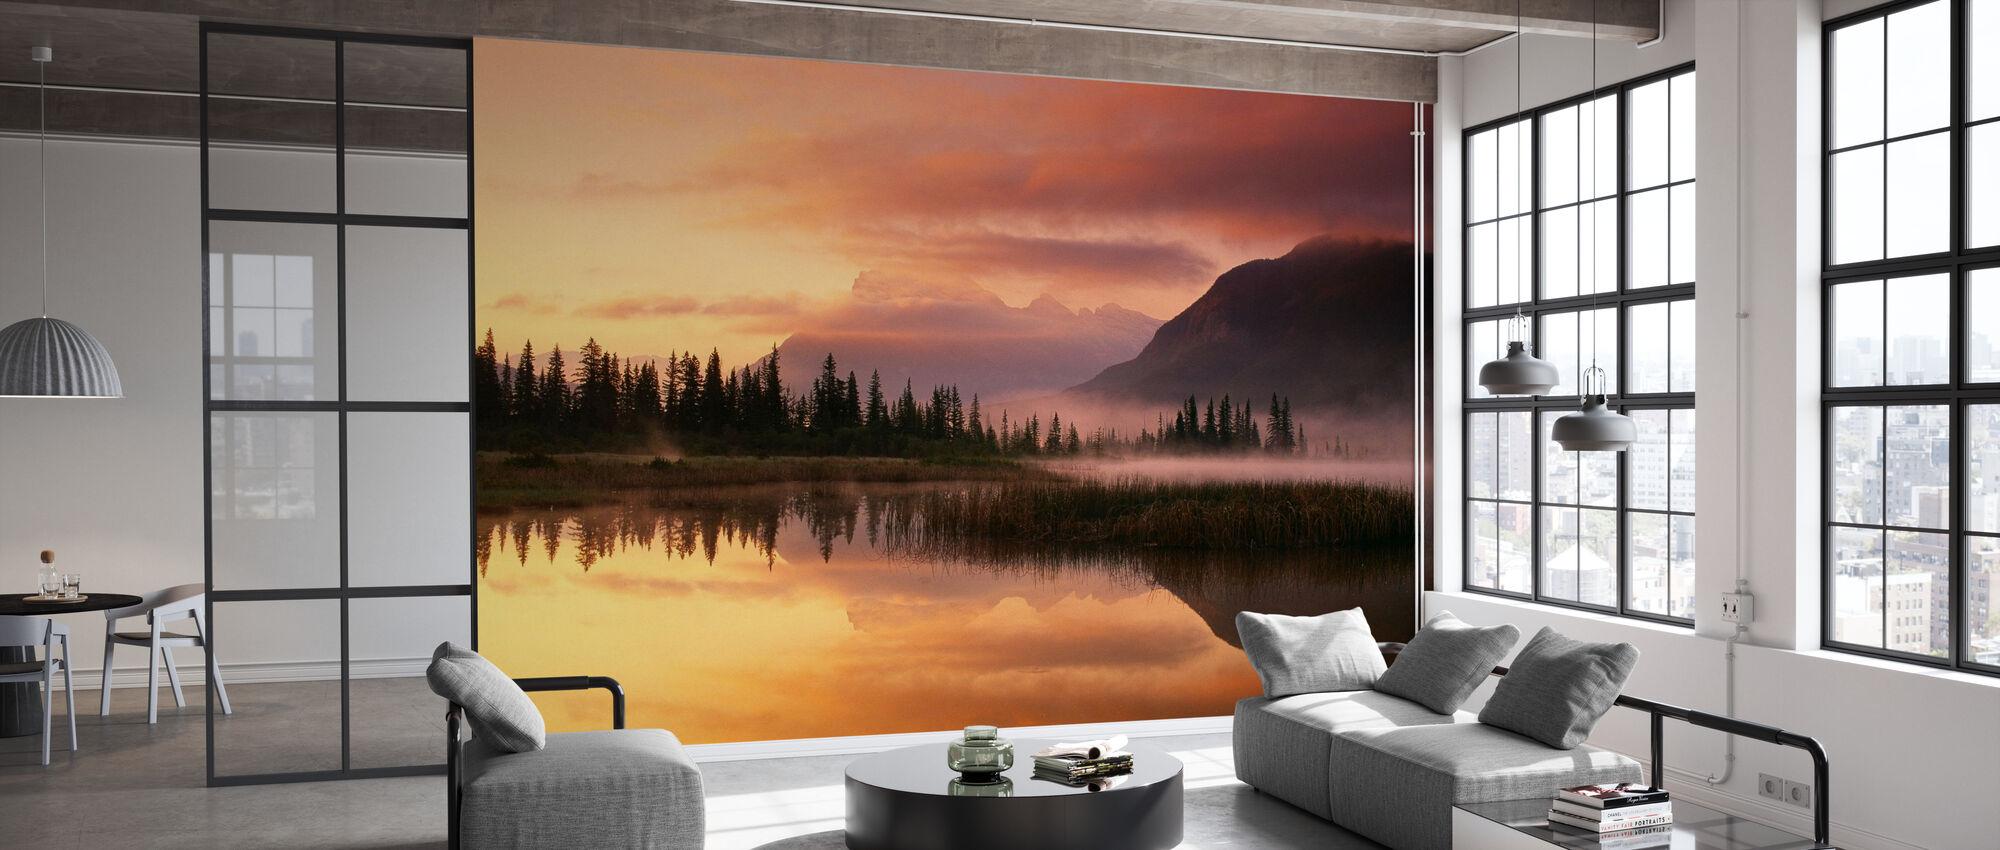 Orange Reflection - Wallpaper - Office